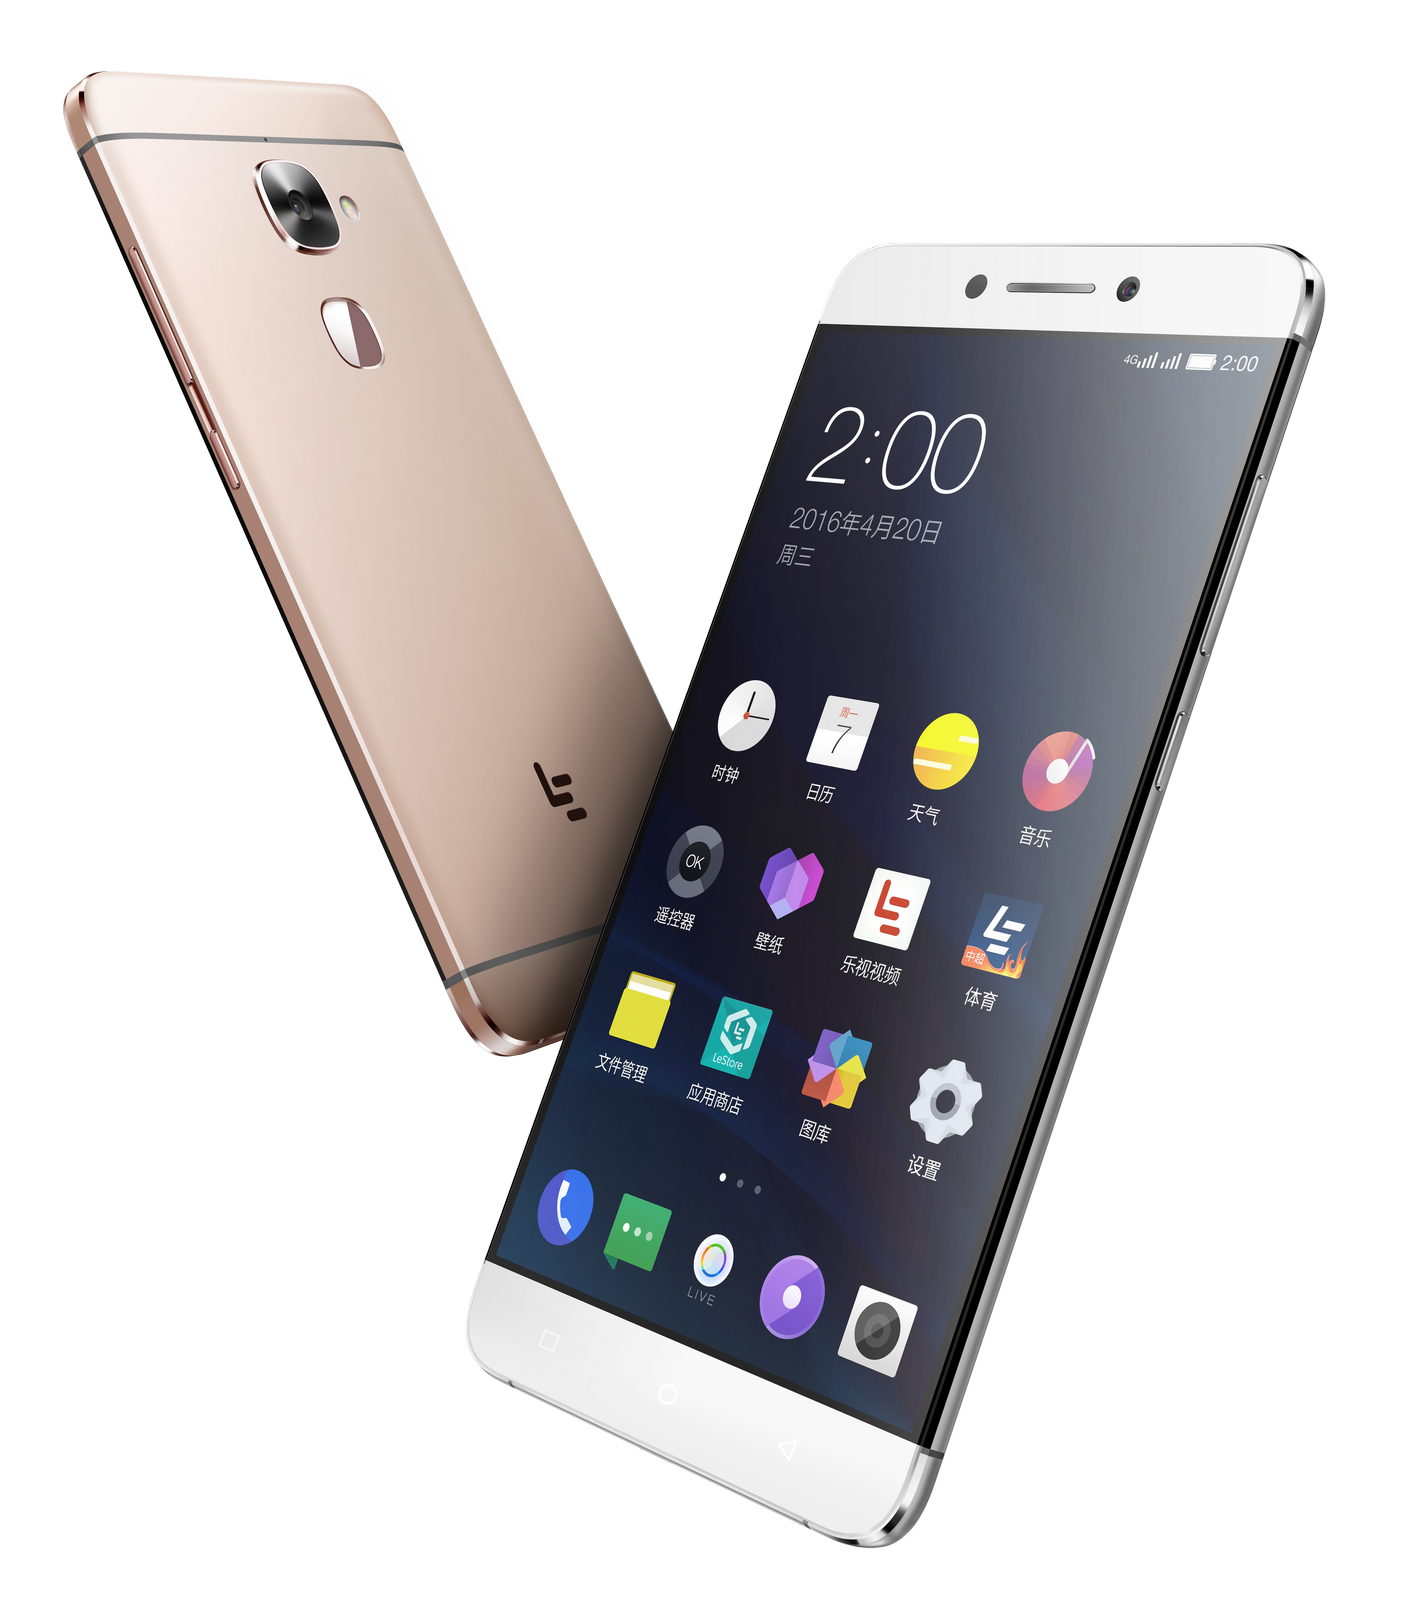 Смартфоны Leeco - технологии совершенства